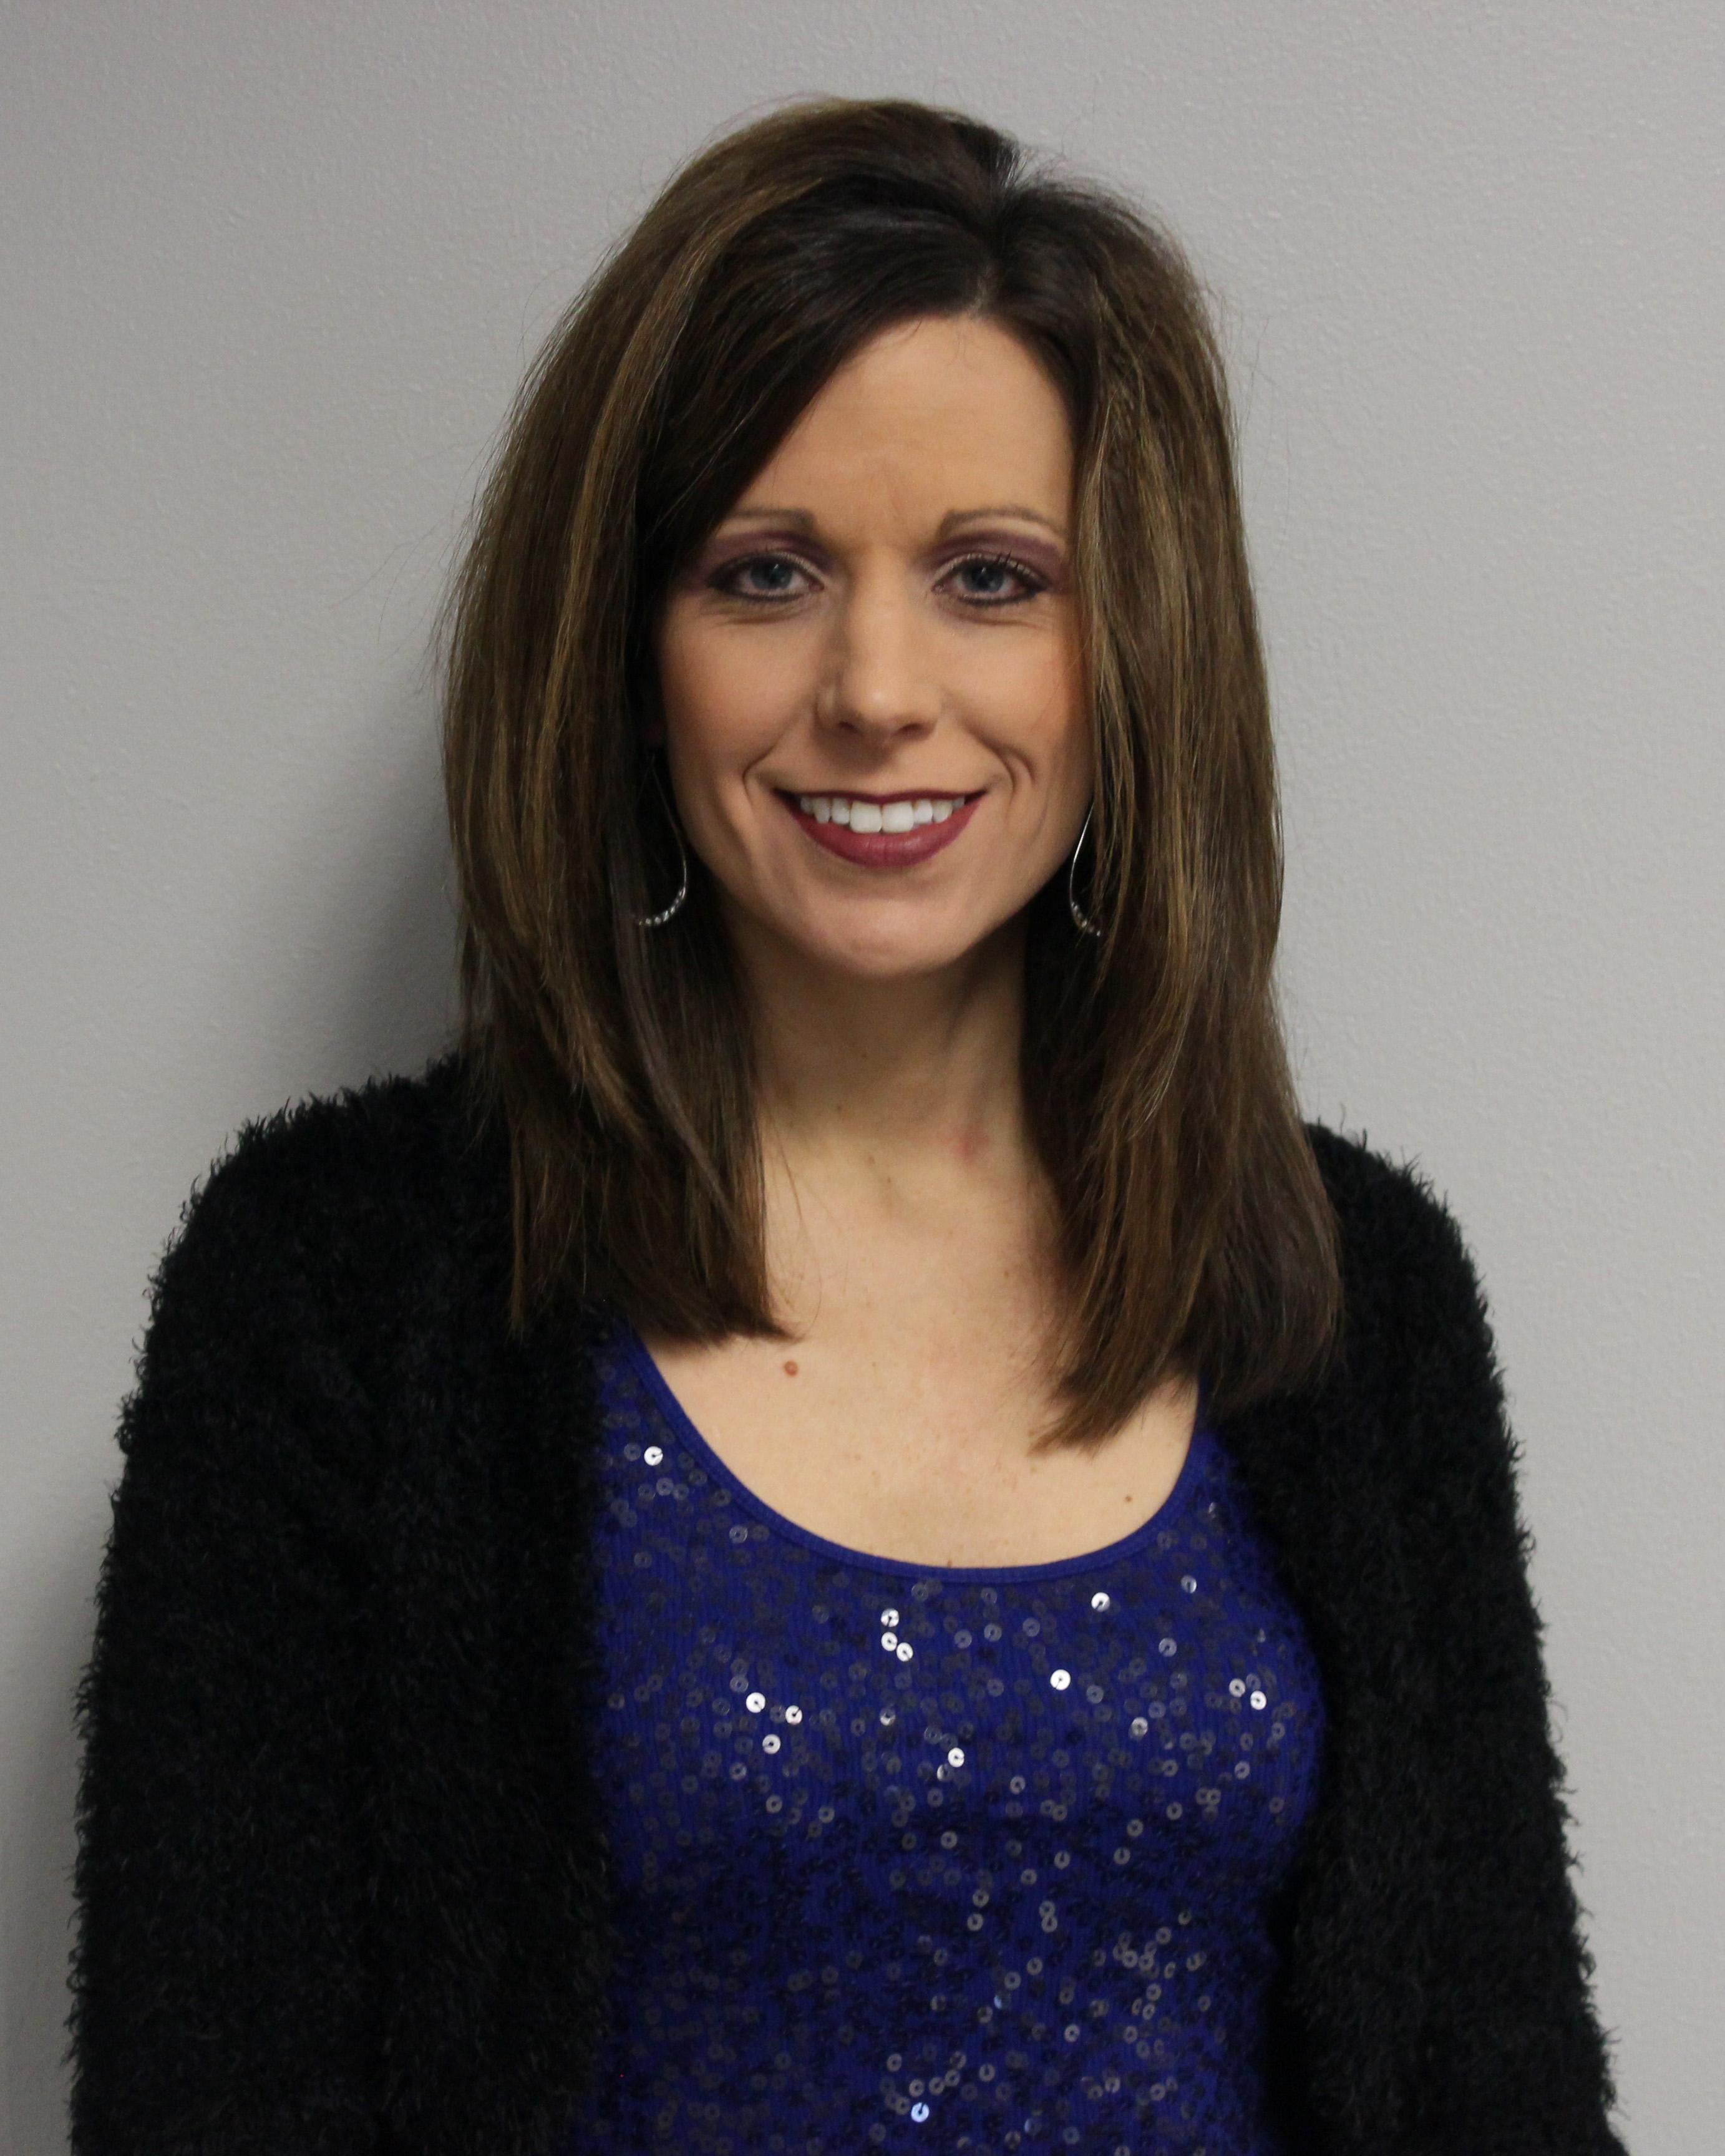 Valerie Villani